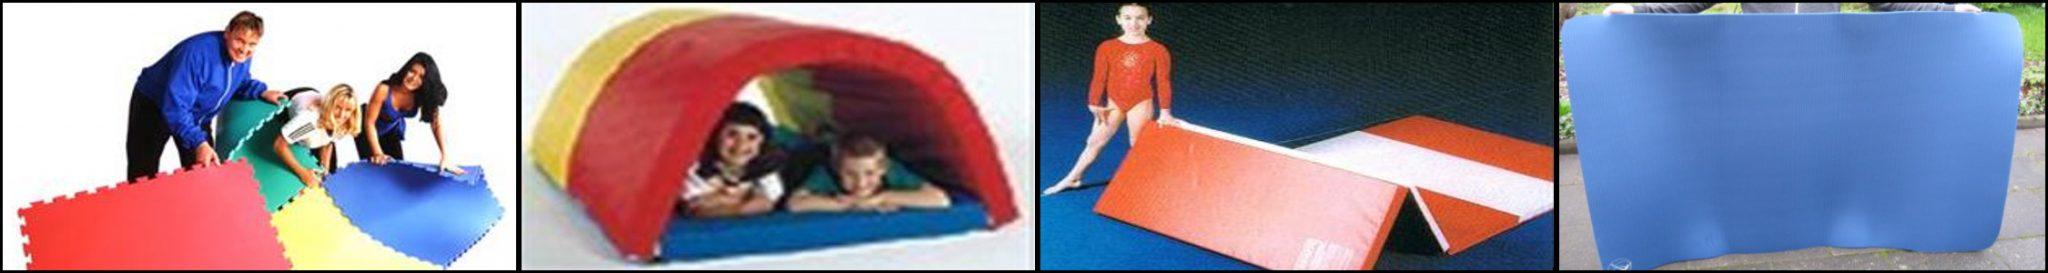 gymnastik måtter